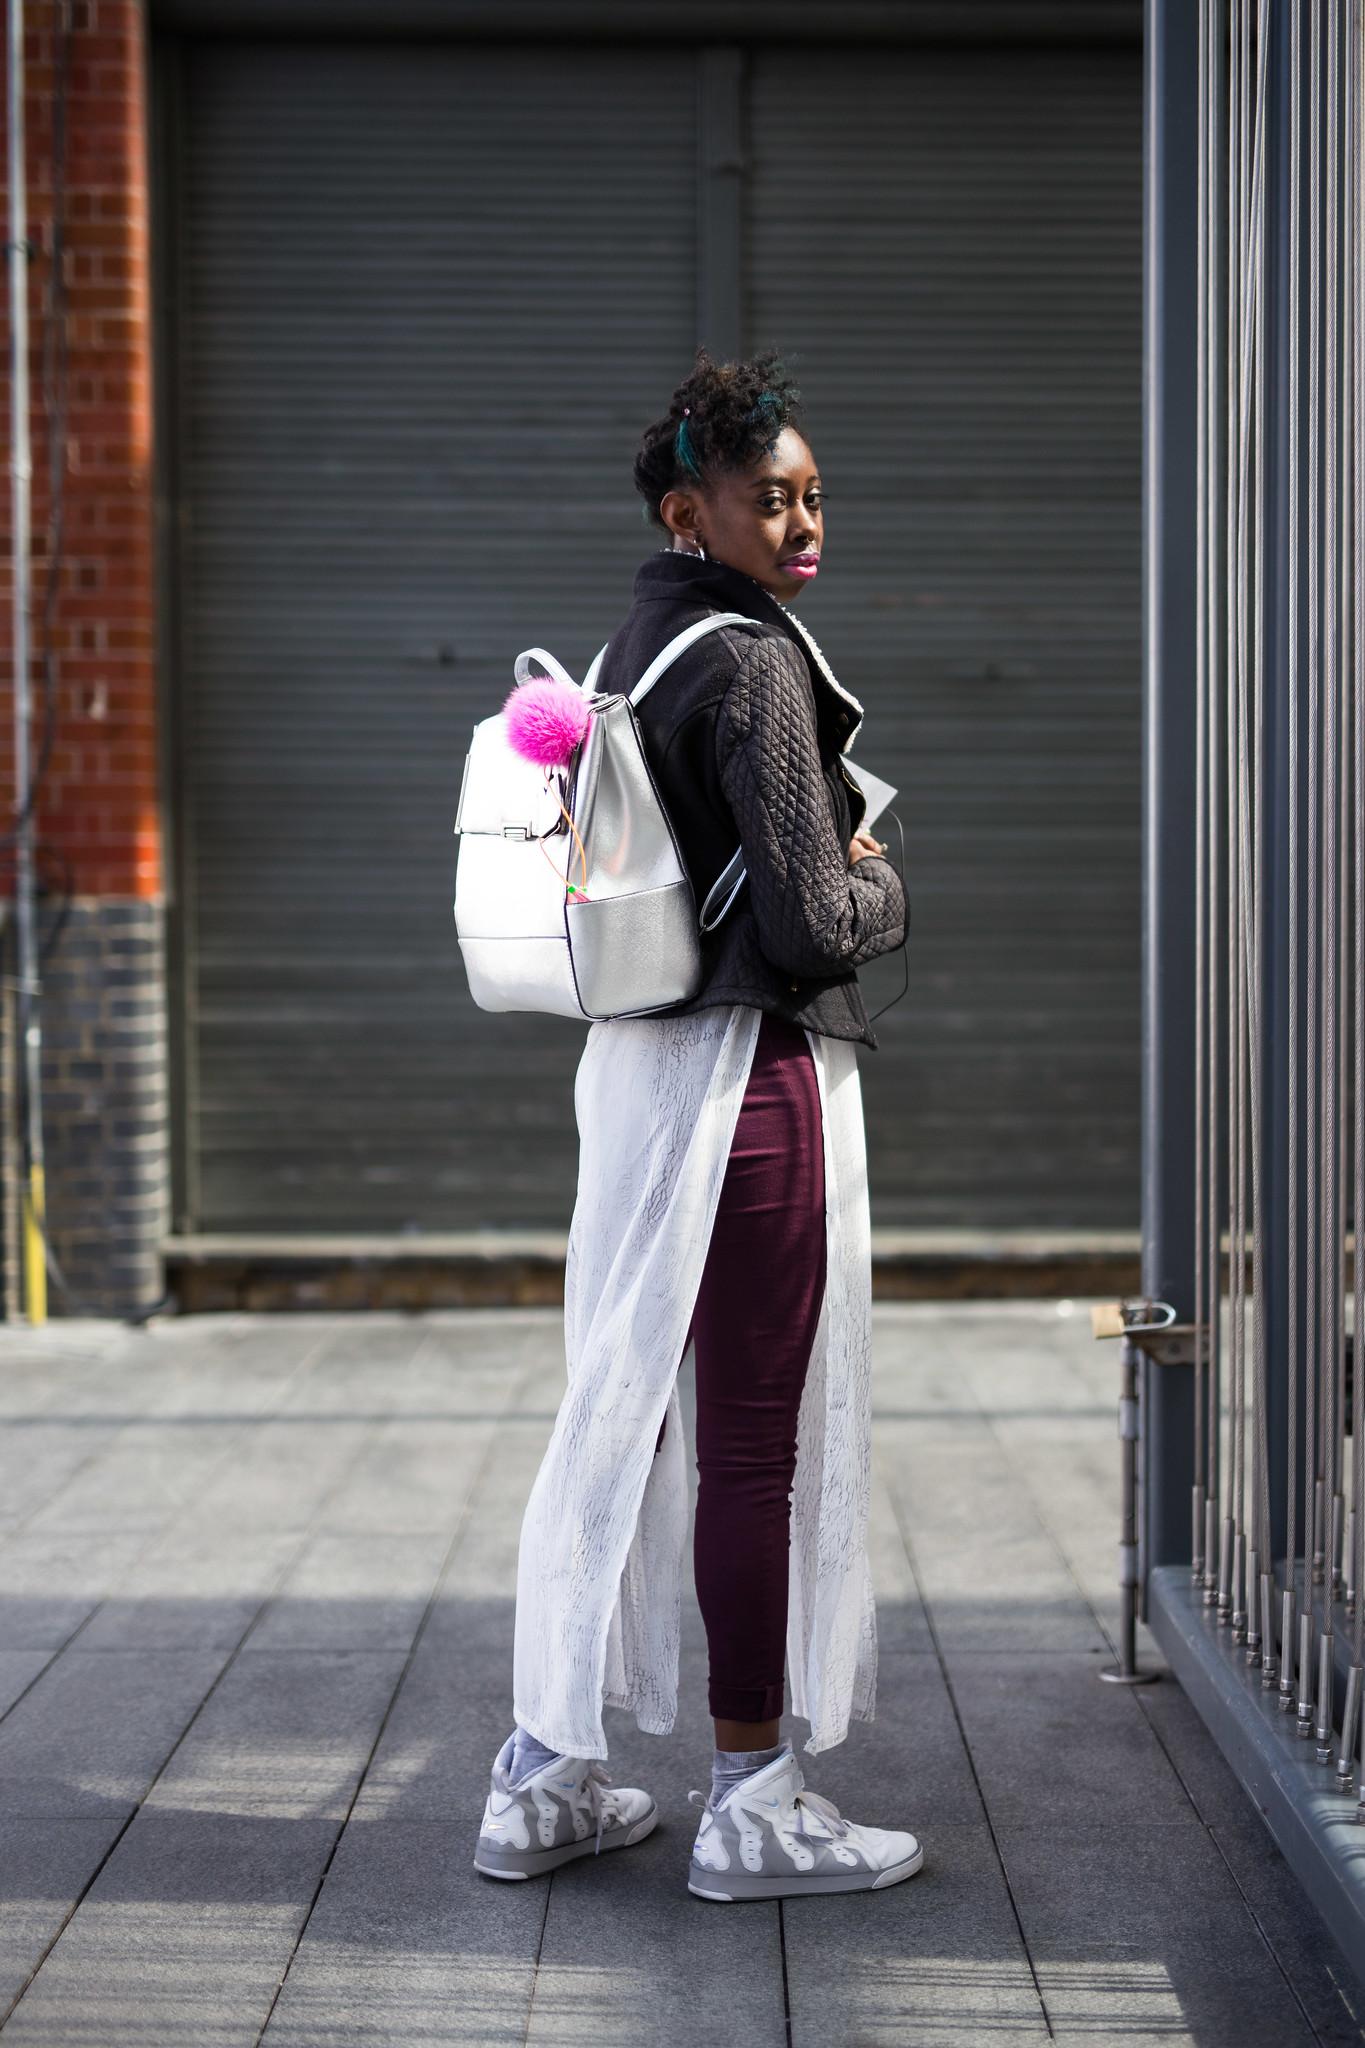 Street Style - Gabriella, Spitalfields Market